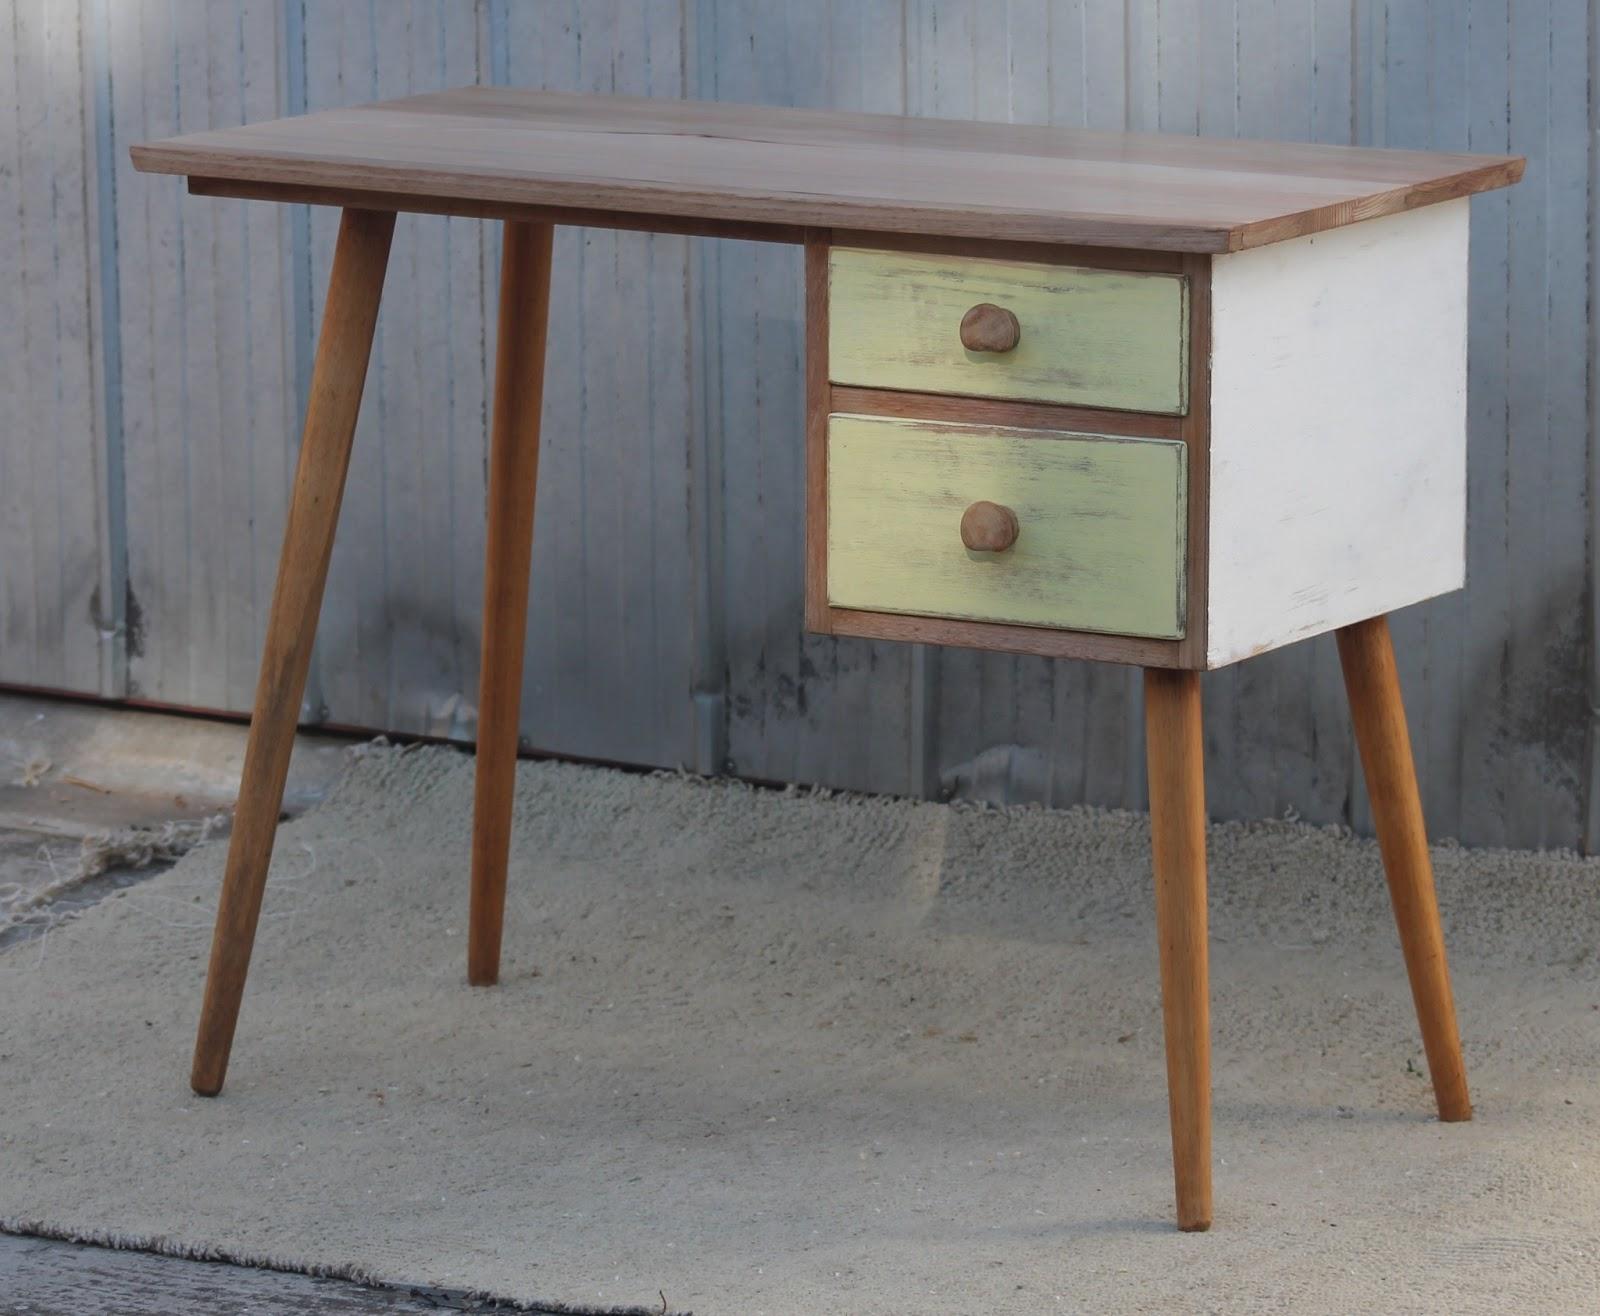 renovated sixties retro desk sold